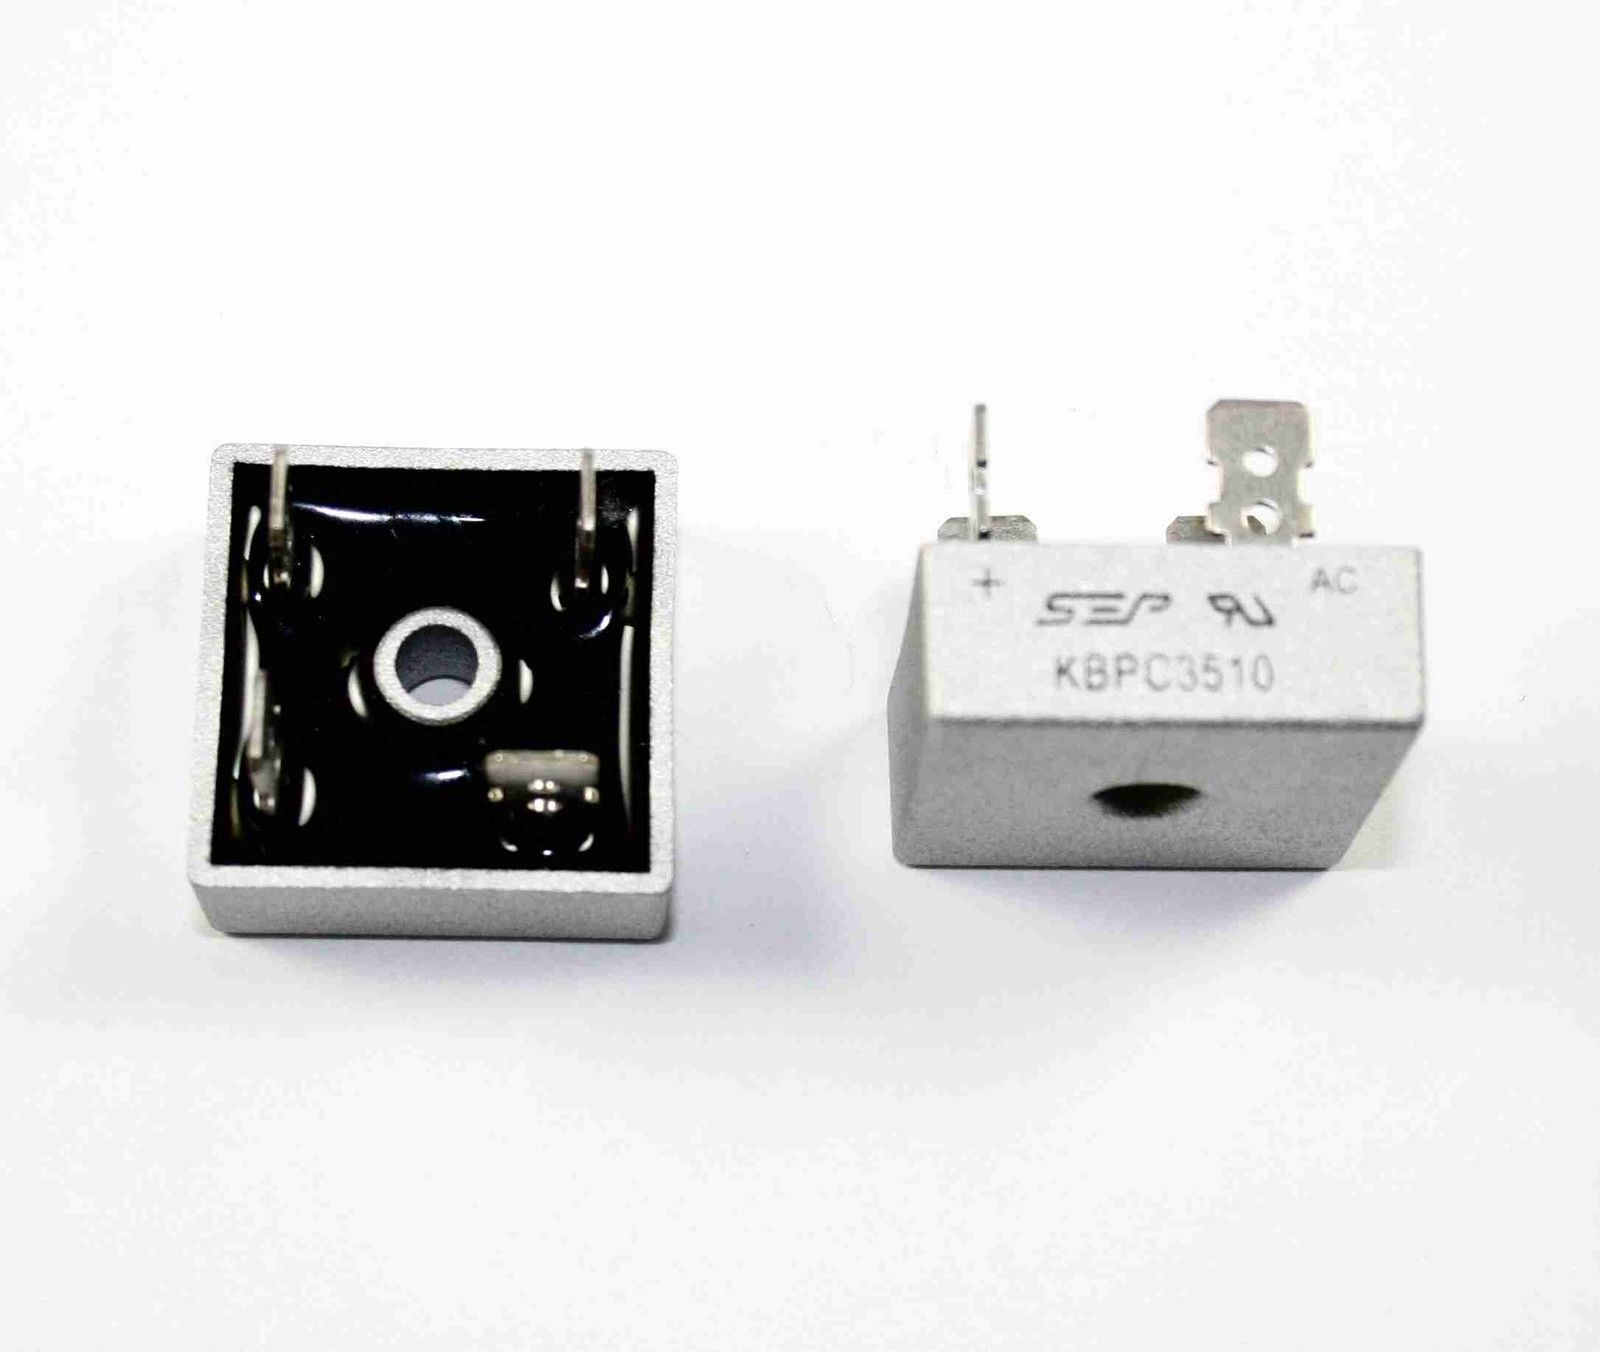 W10M General Instruments W10M Bridge Rectifier 0.5Amp 1000vrrm Lot of 10